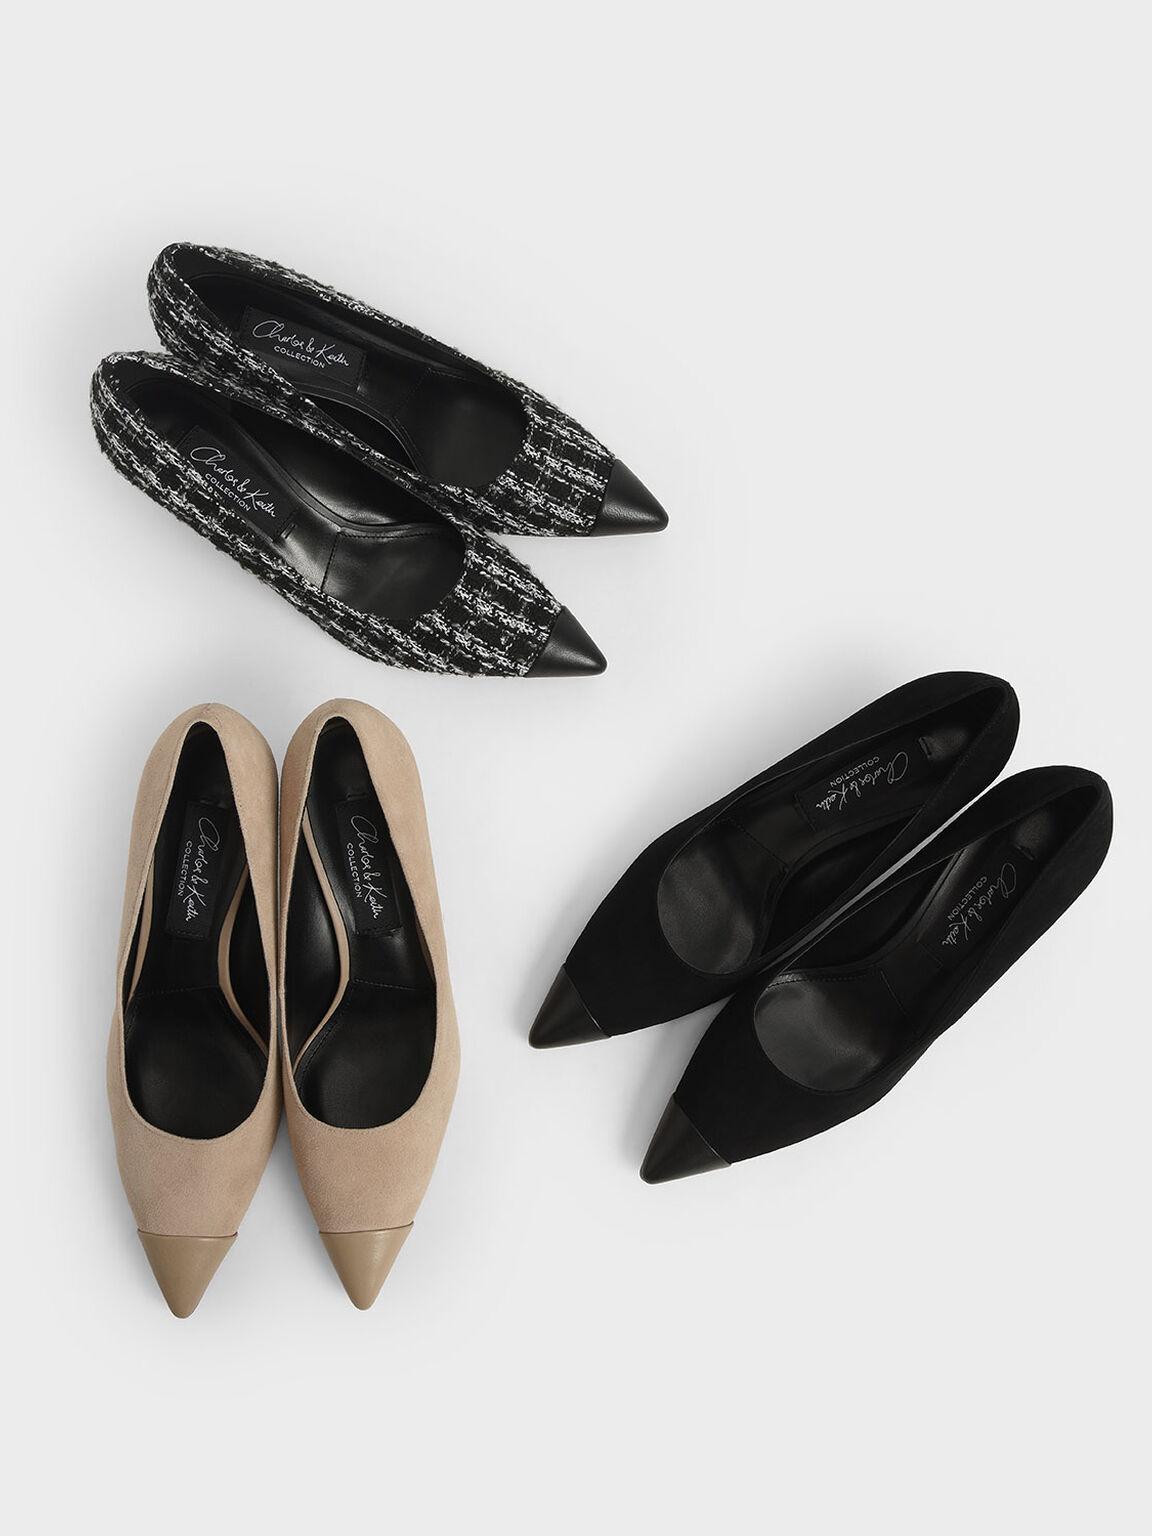 Leather & Tweed Sculptural Heel Pumps, Black, hi-res